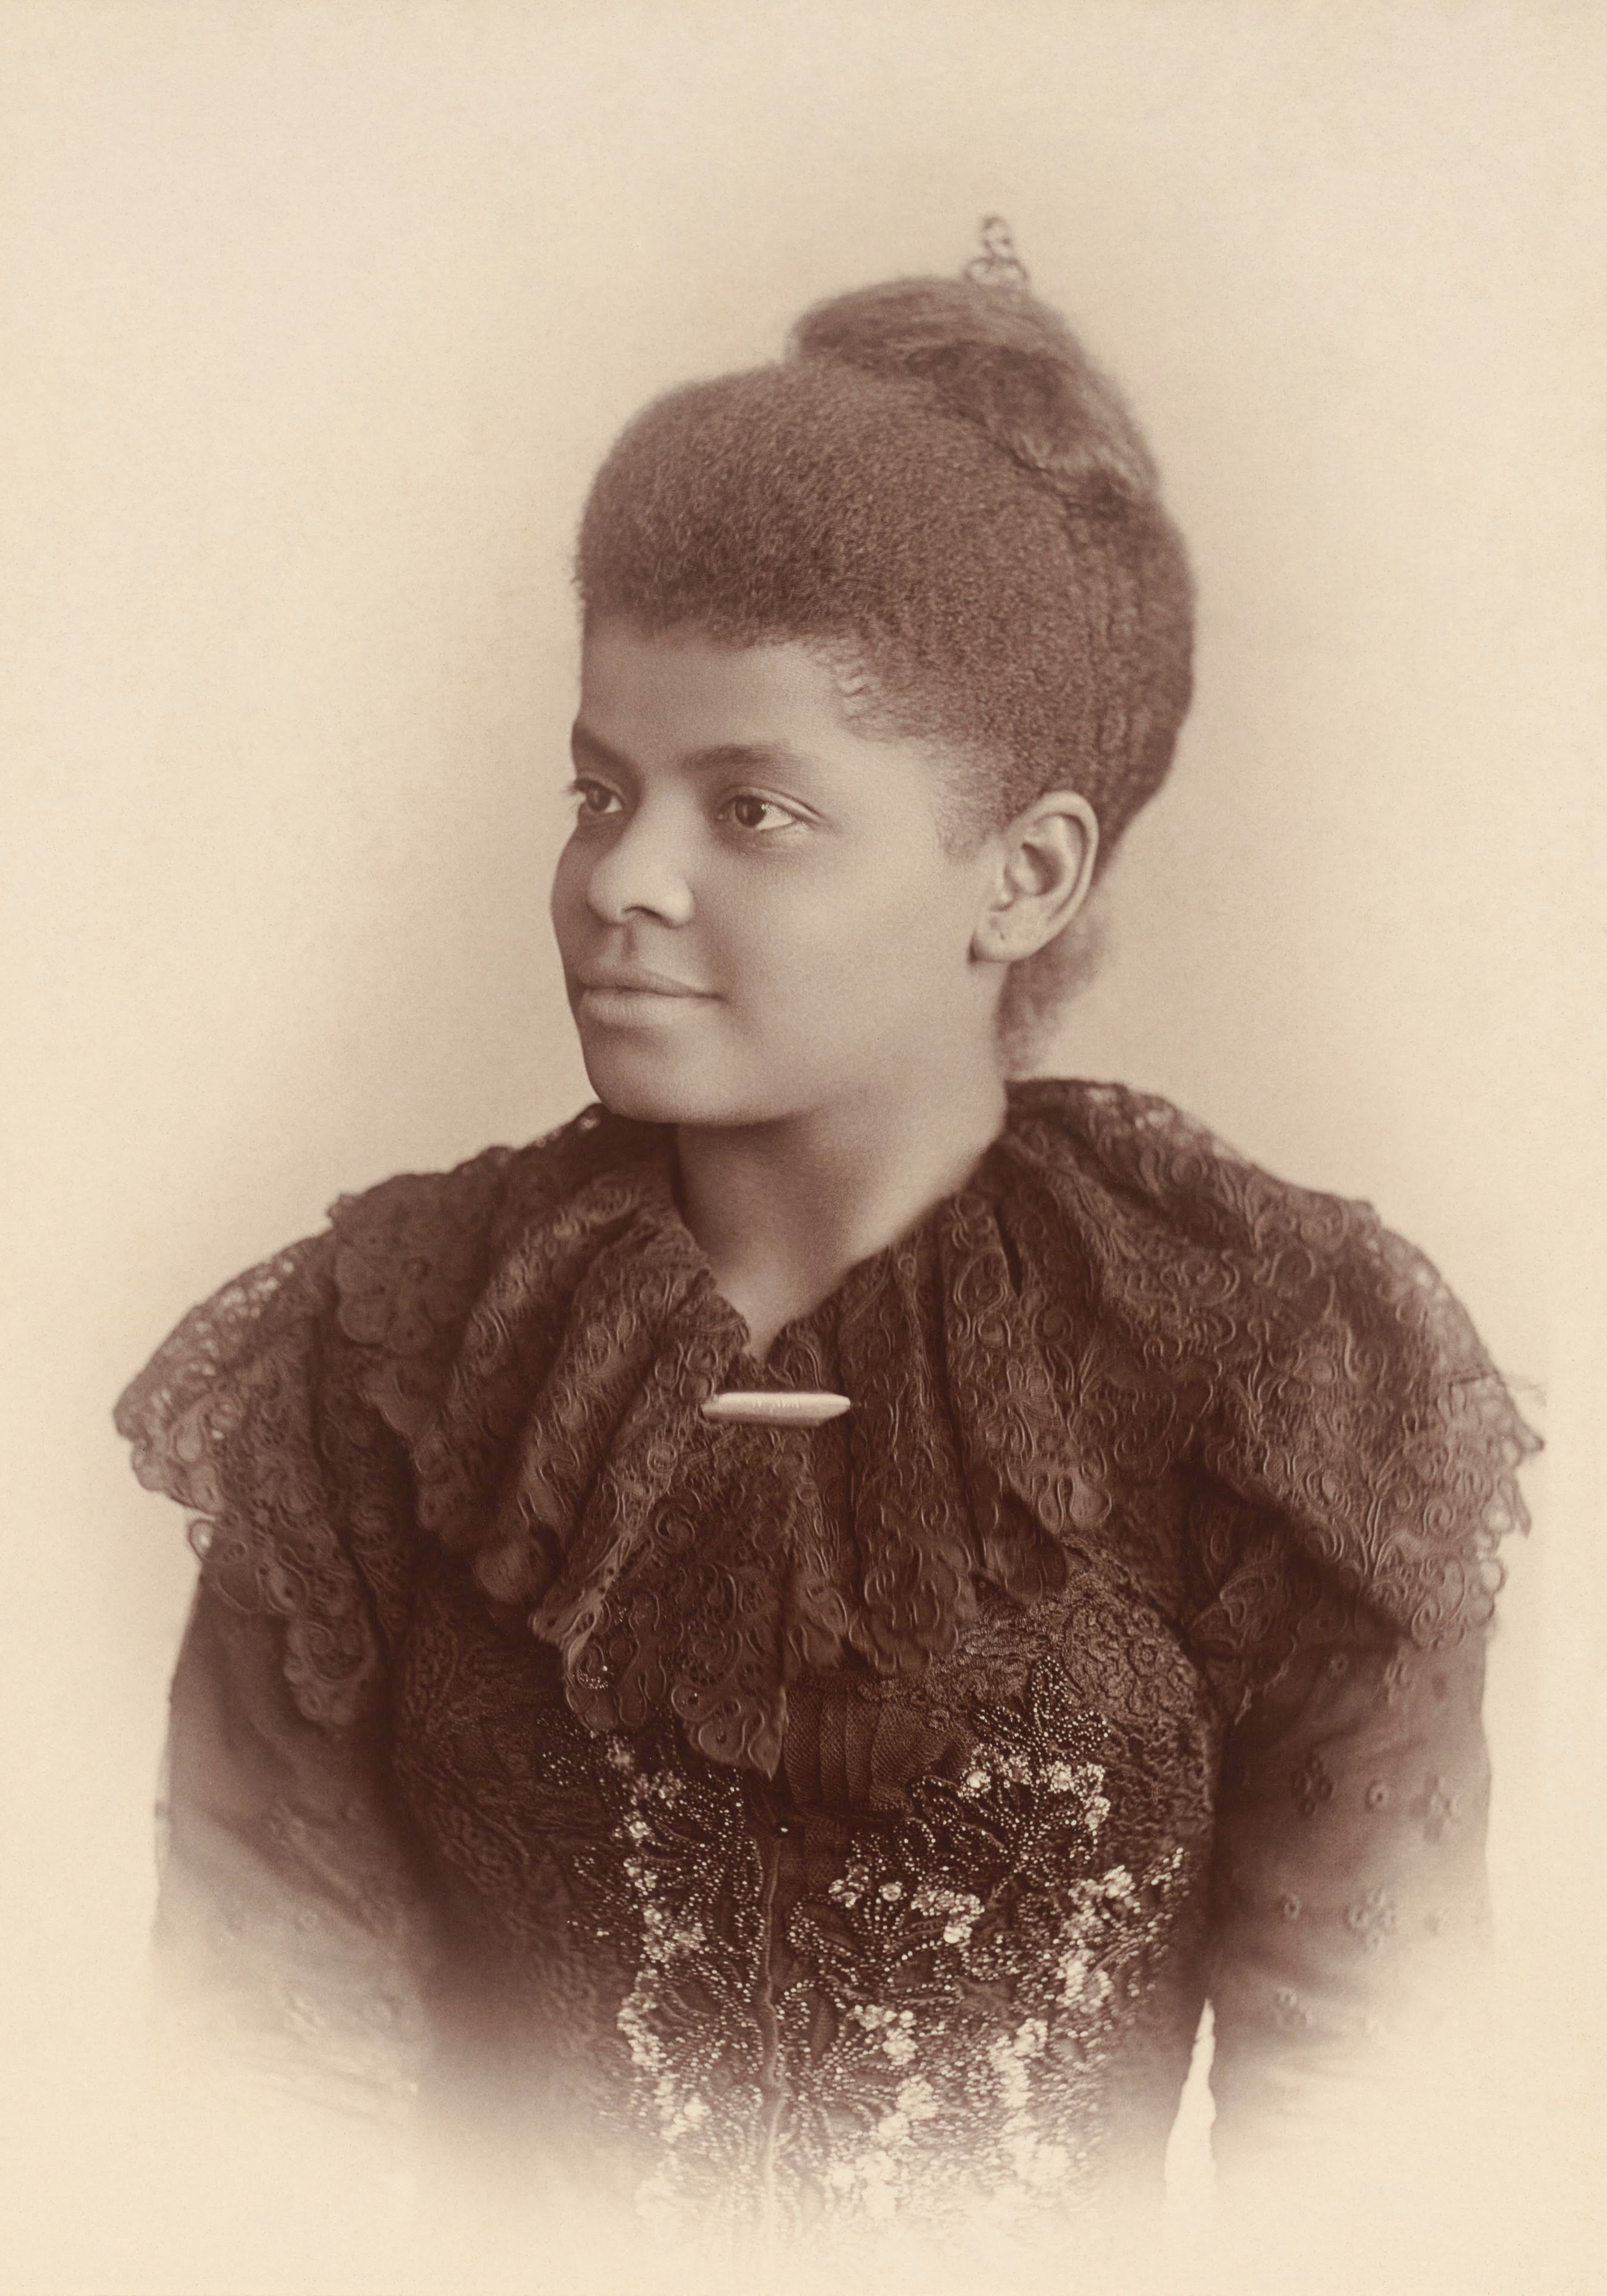 Activist Ida B. Wells